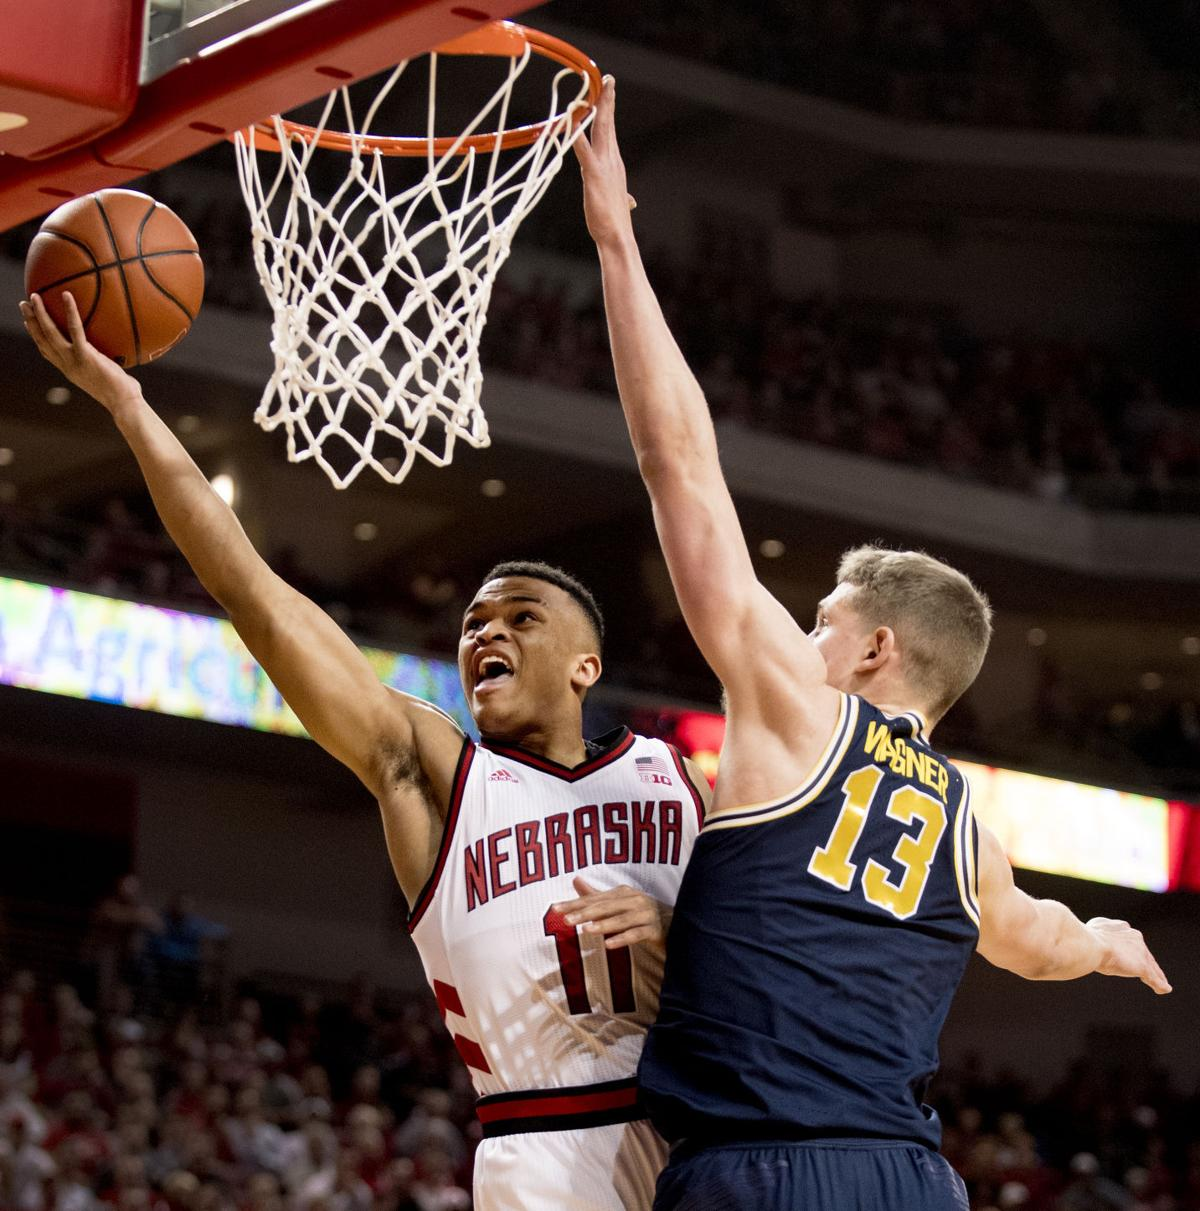 Michigan Basketball vs. Nebraska, 1/18/18